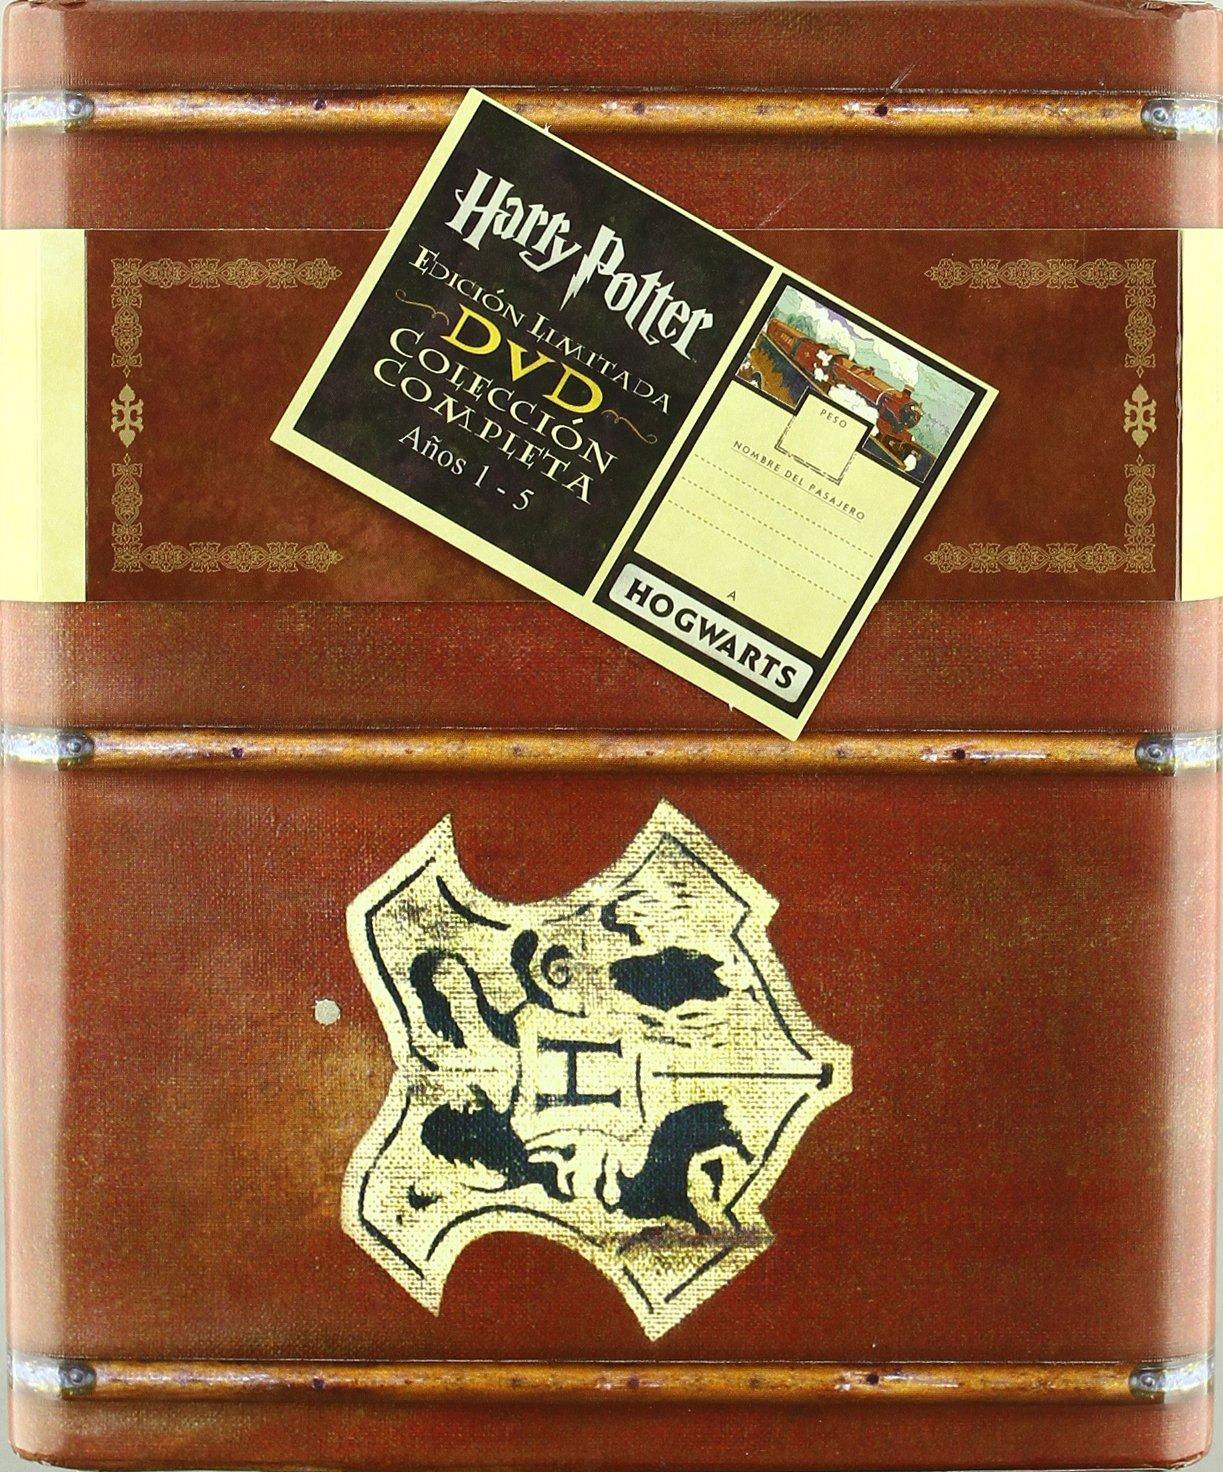 Harry Potter - Edición Limitada Coleccion completa Años 1 - 5 DVD: Amazon.es: Daniel Radcliffe, Harry Melling, Richard Harris, Fiona Shaw, Rupert Grint, Emma Watson, Varios, Chris Columbus, David Yates, Alfonso Cuaron,